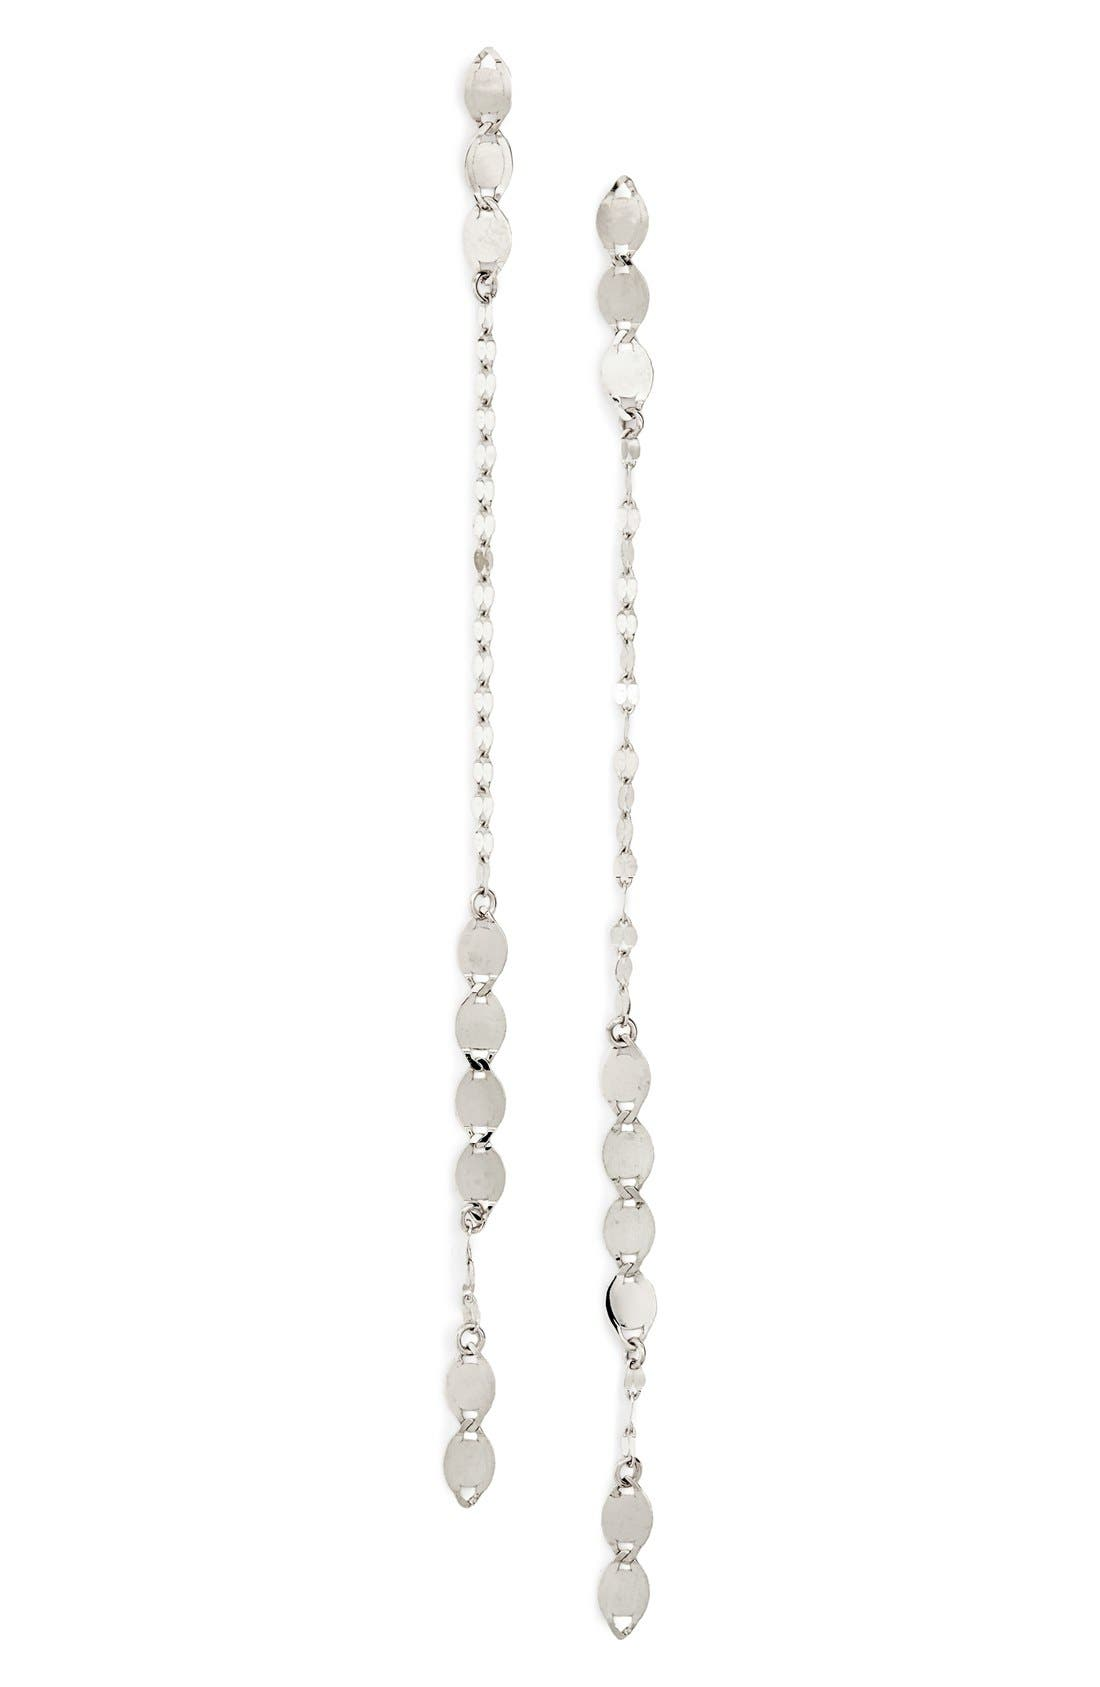 Linear Drop Earrings,                             Main thumbnail 1, color,                             711